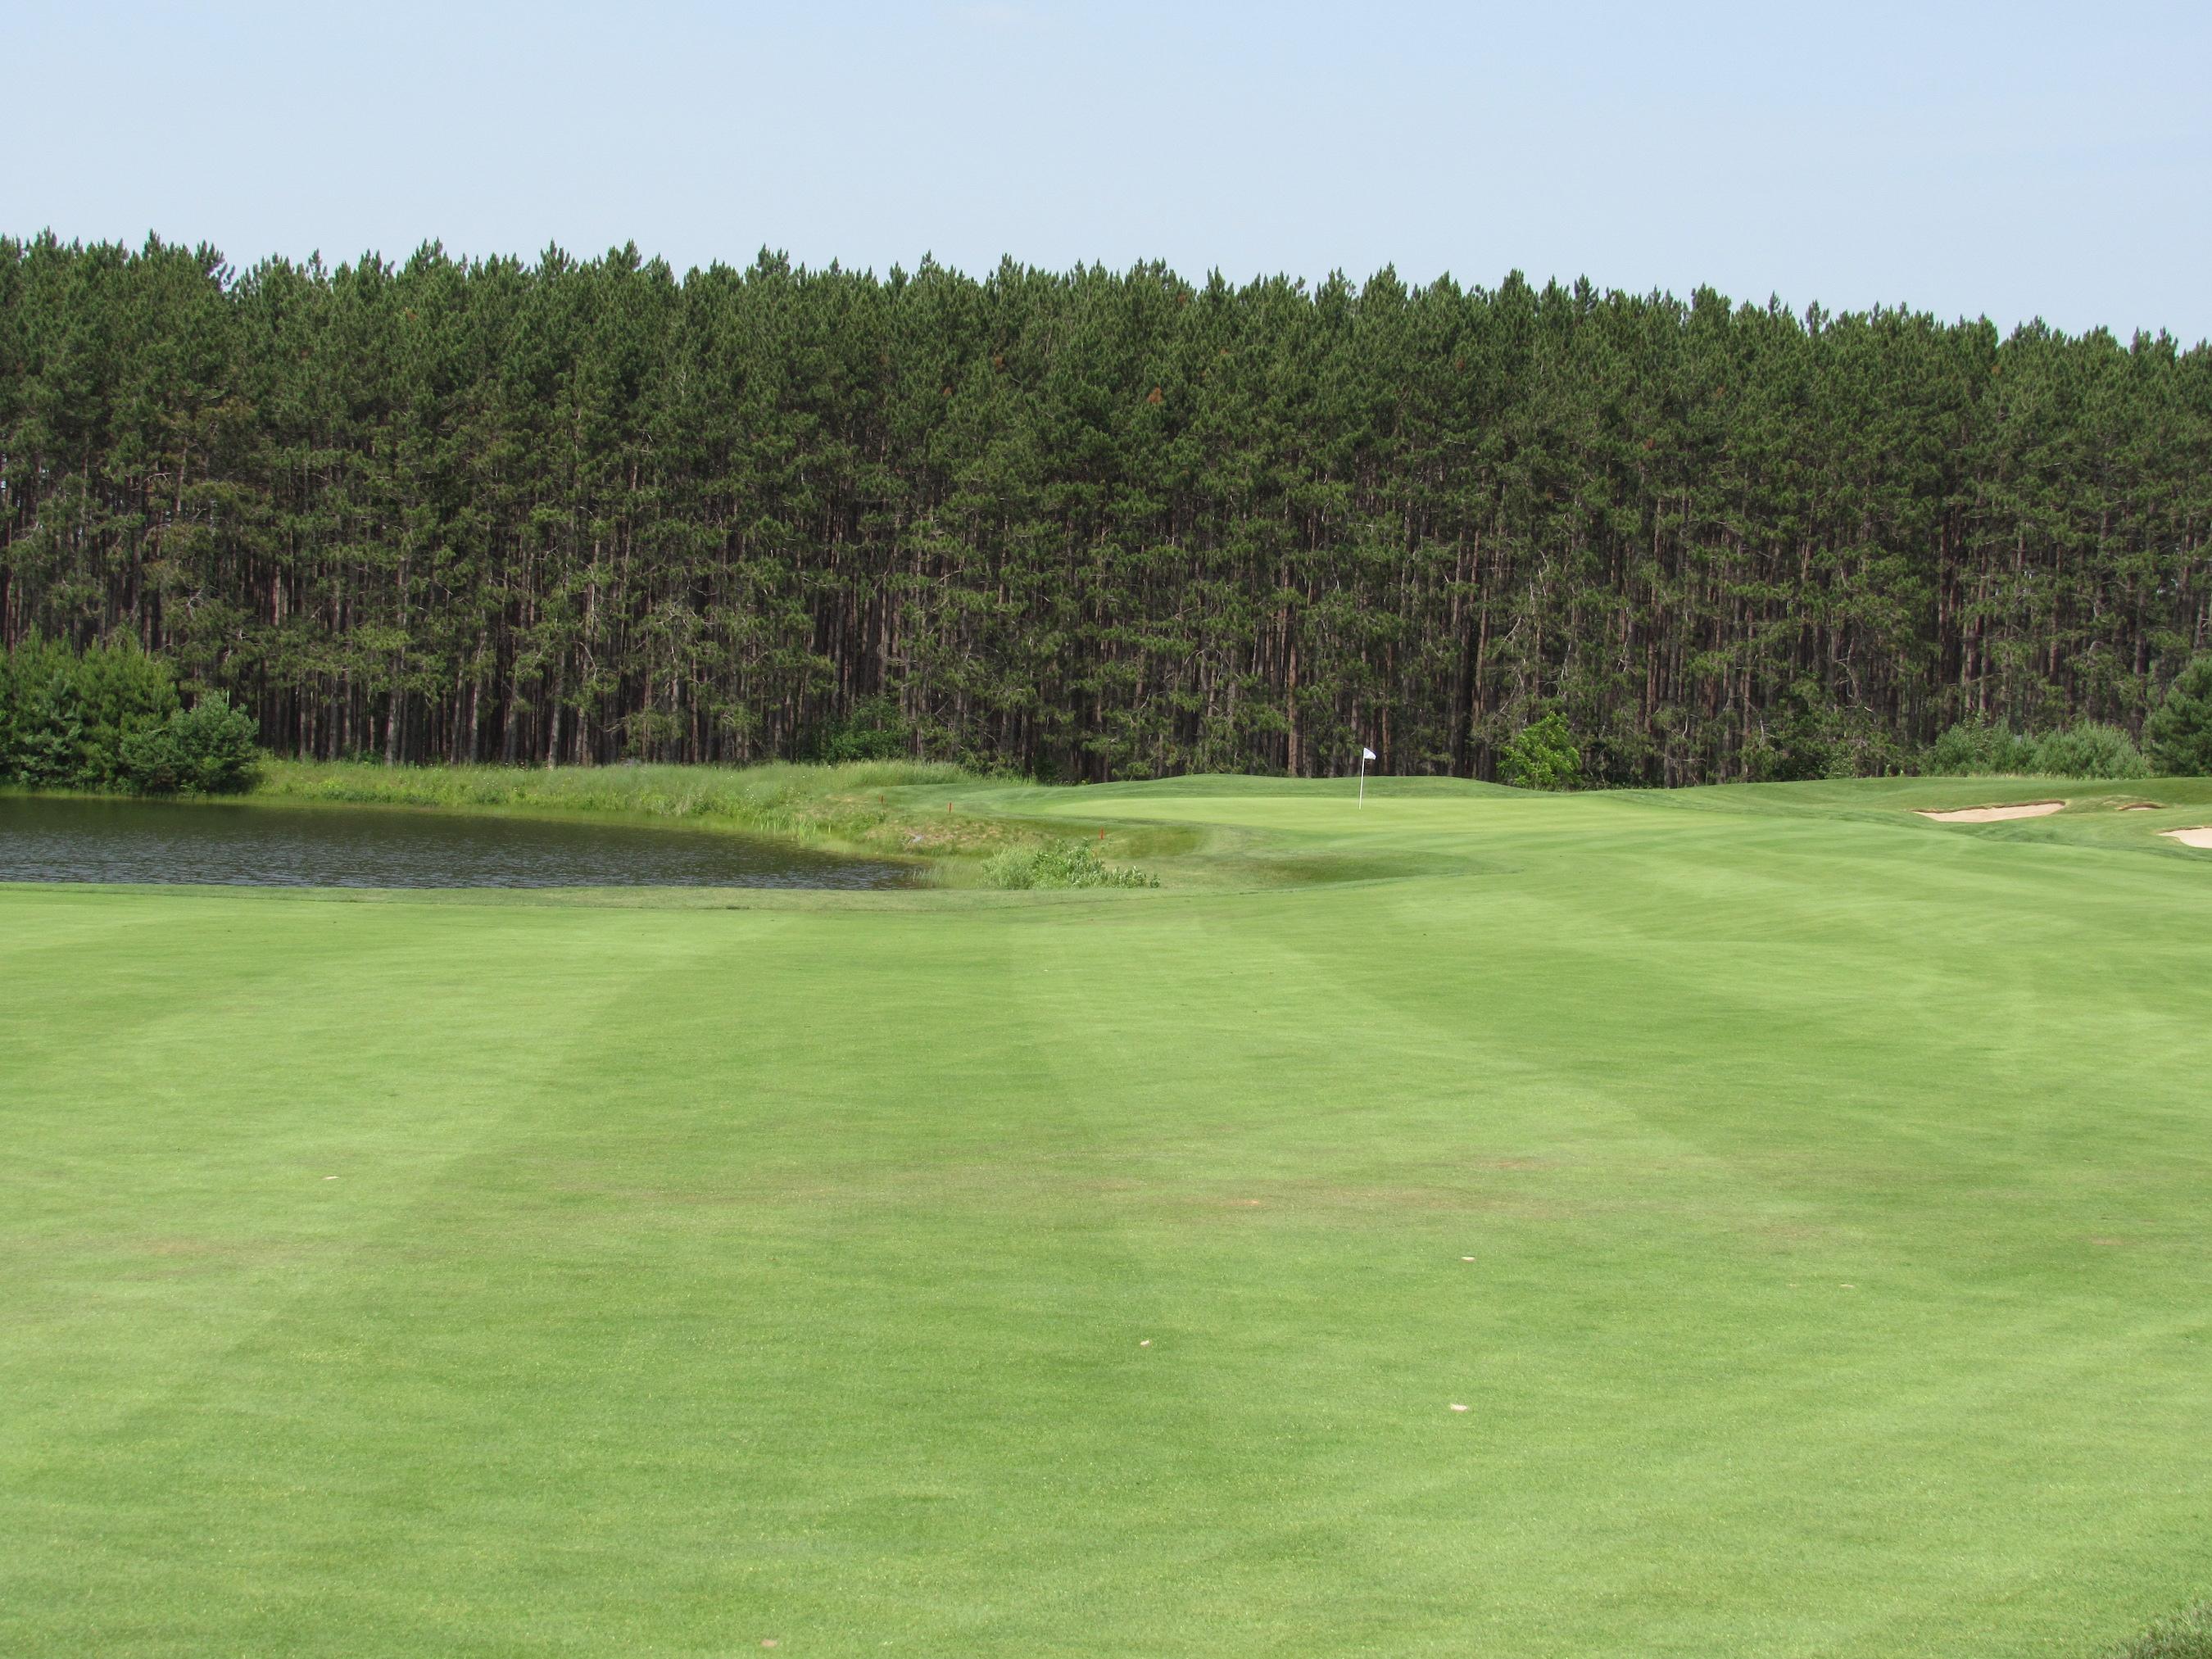 Boyne Highlands Resort: A four-course feast of golf